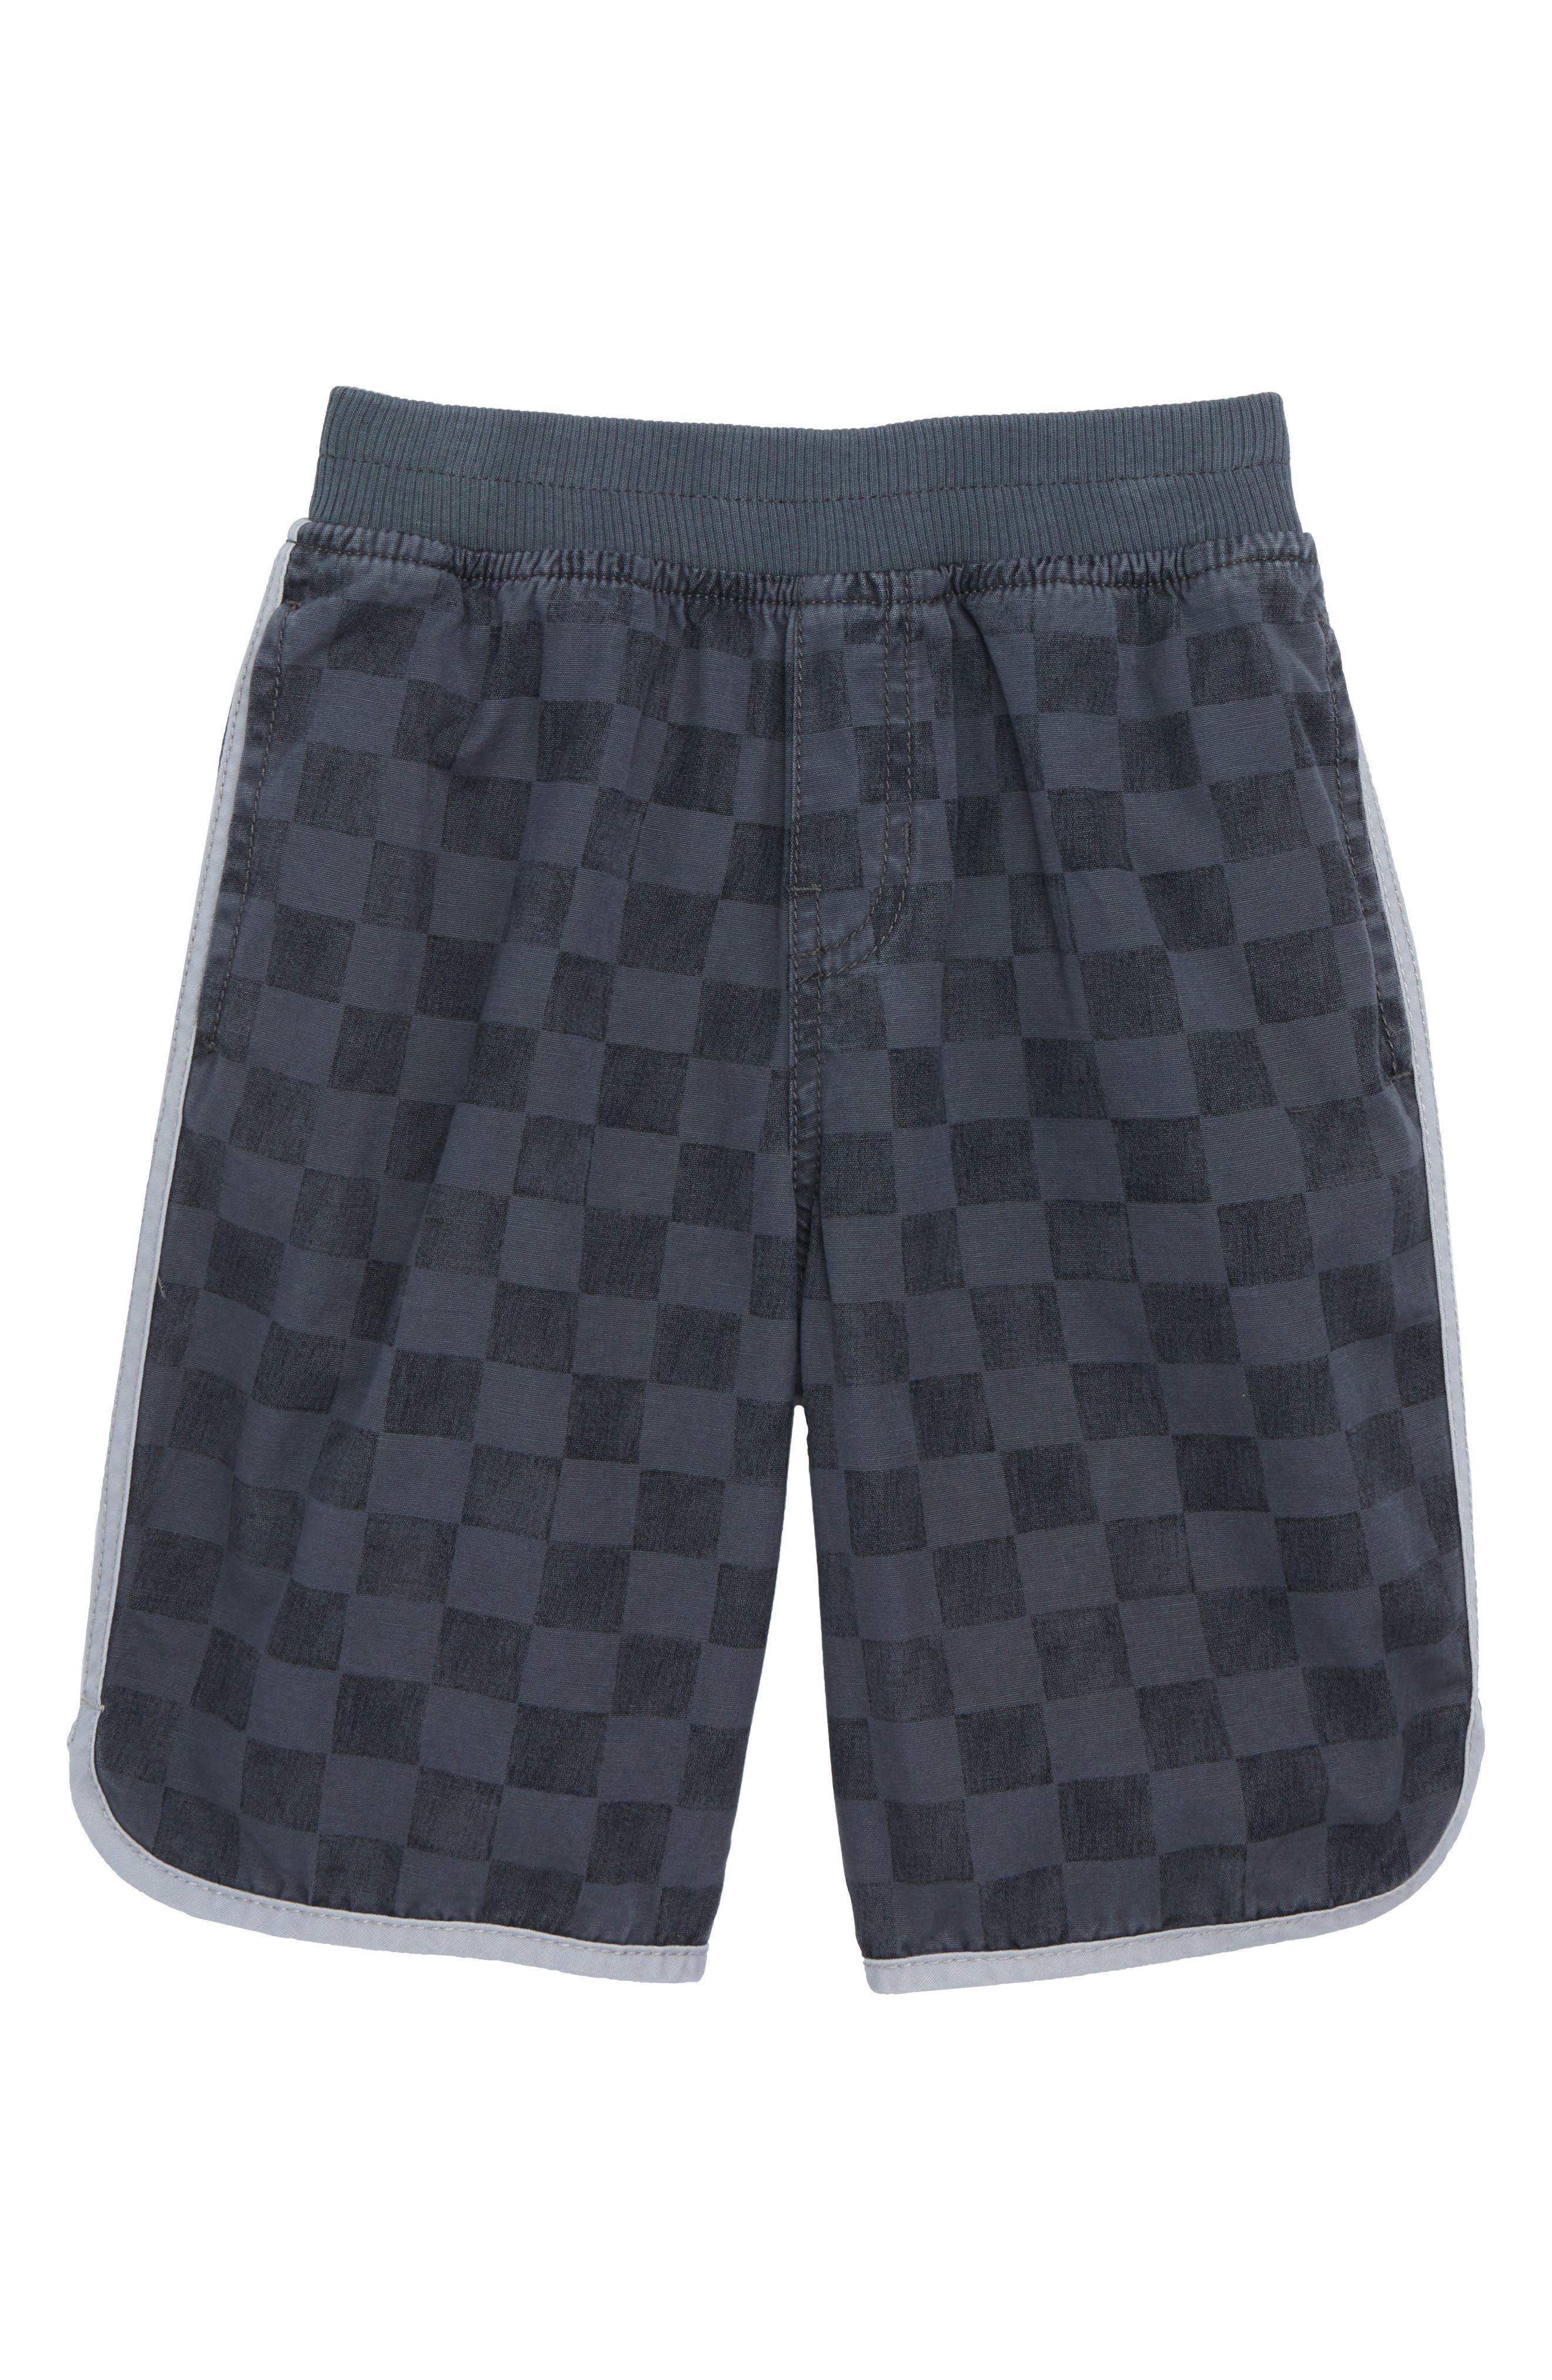 Piped Shorts,                         Main,                         color, 023